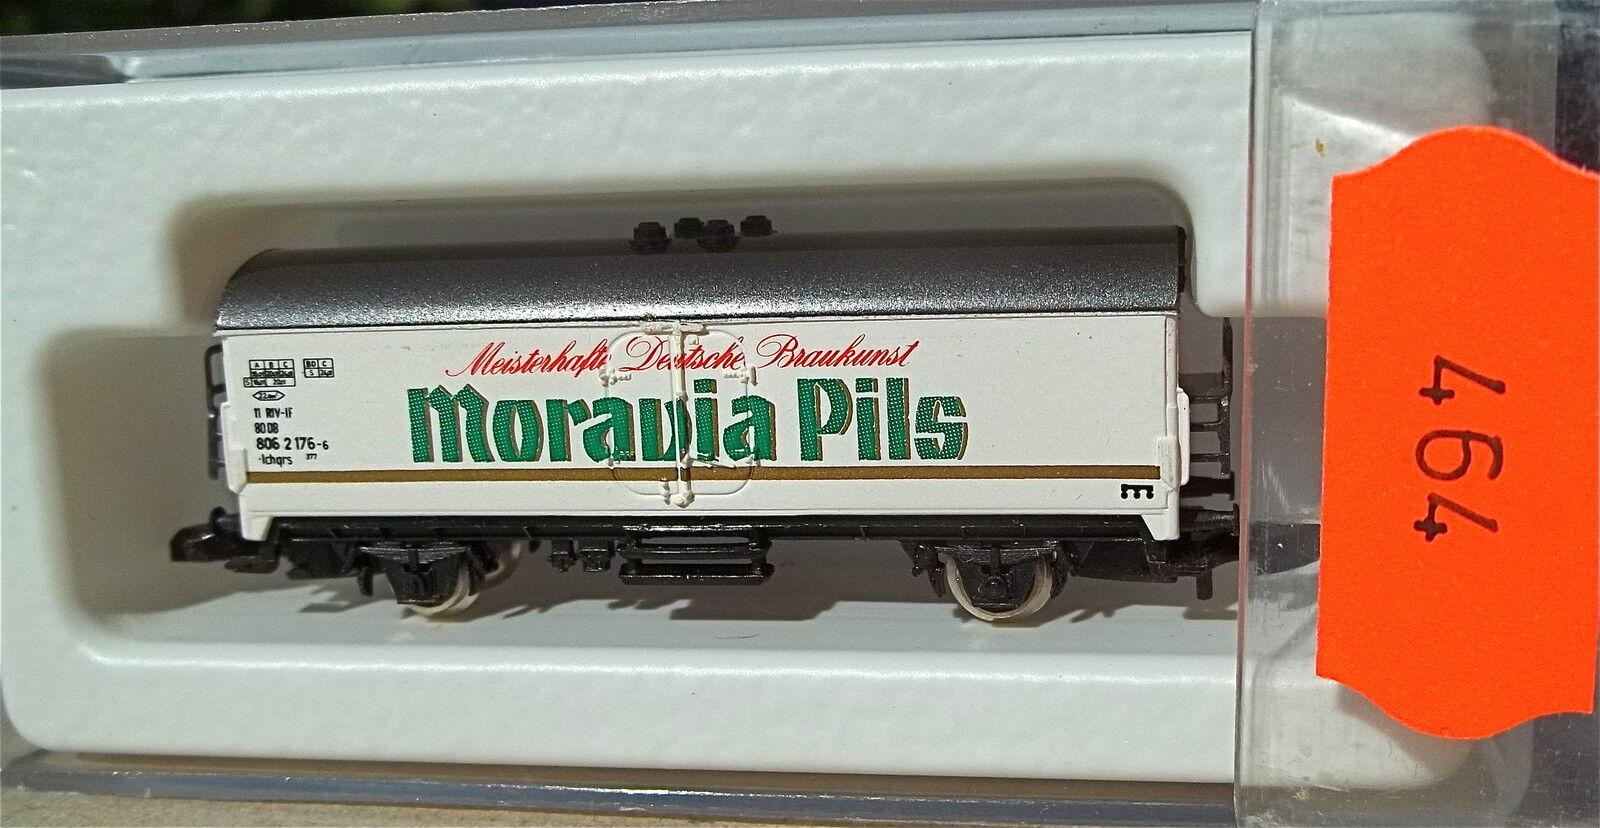 Moravia frossoda, partire 89008 Märklin 8600 Traccia Z 1 220  464